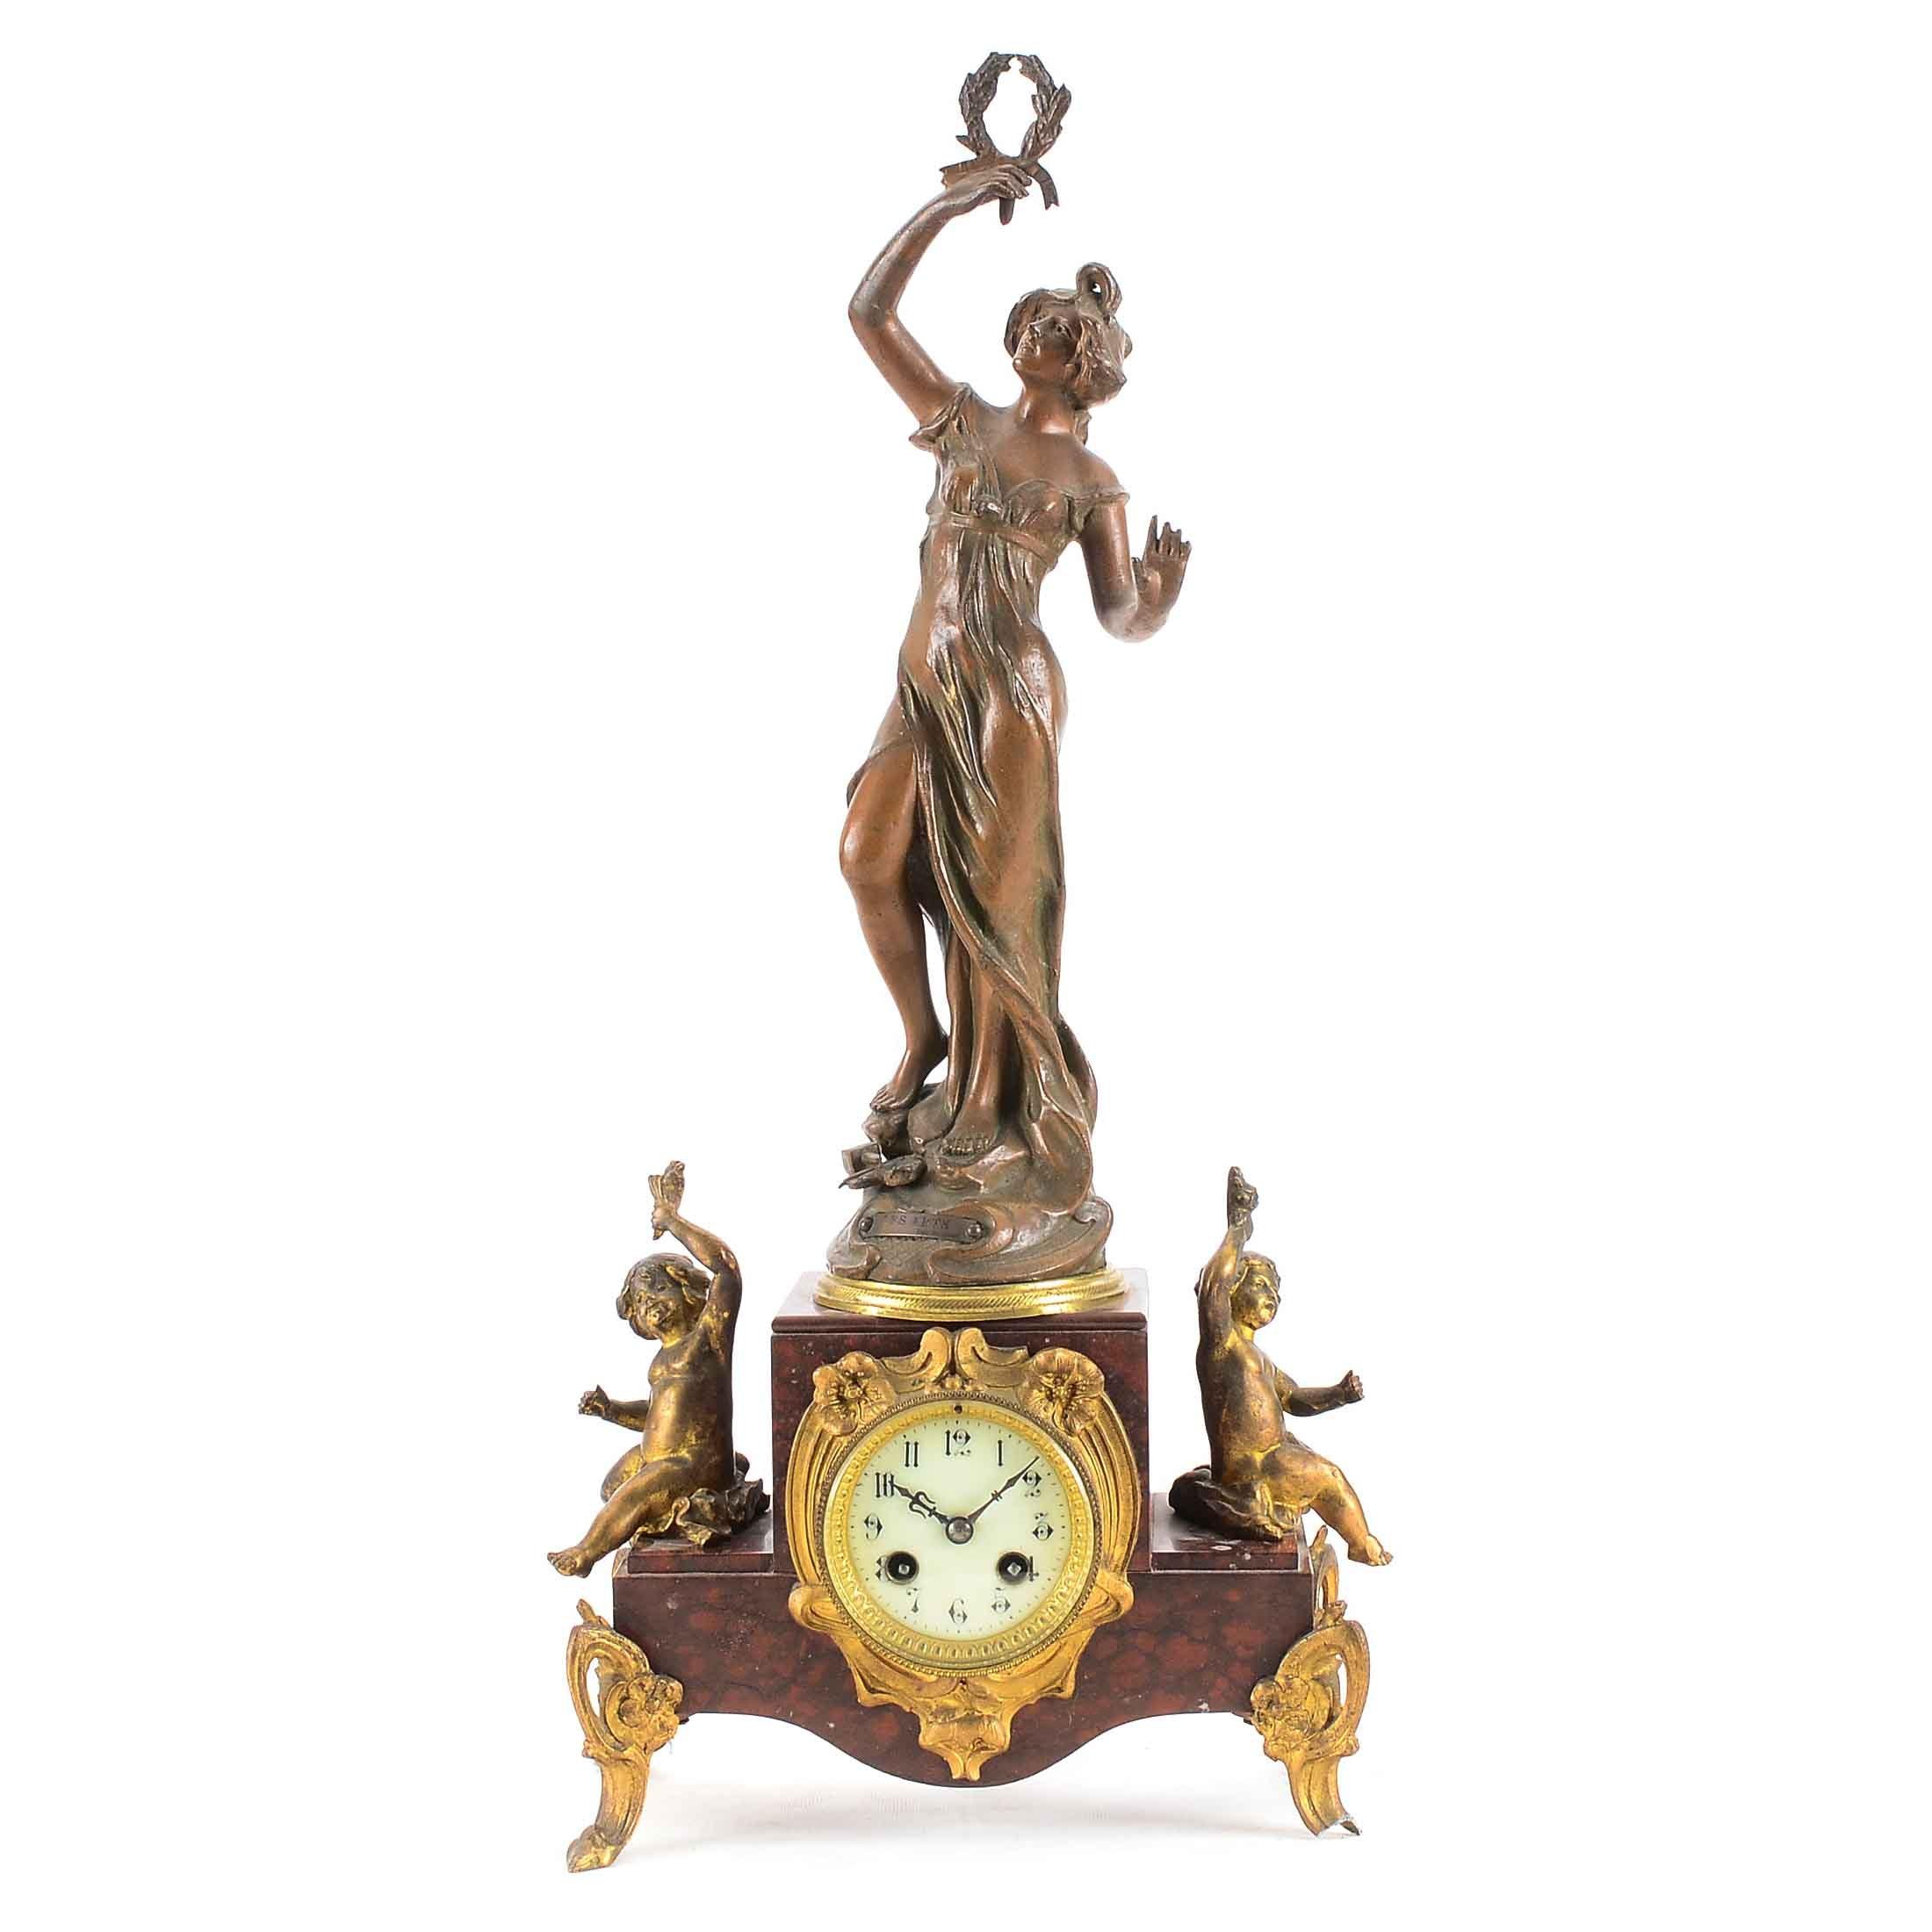 Antique French Sculptural Mantel Clock